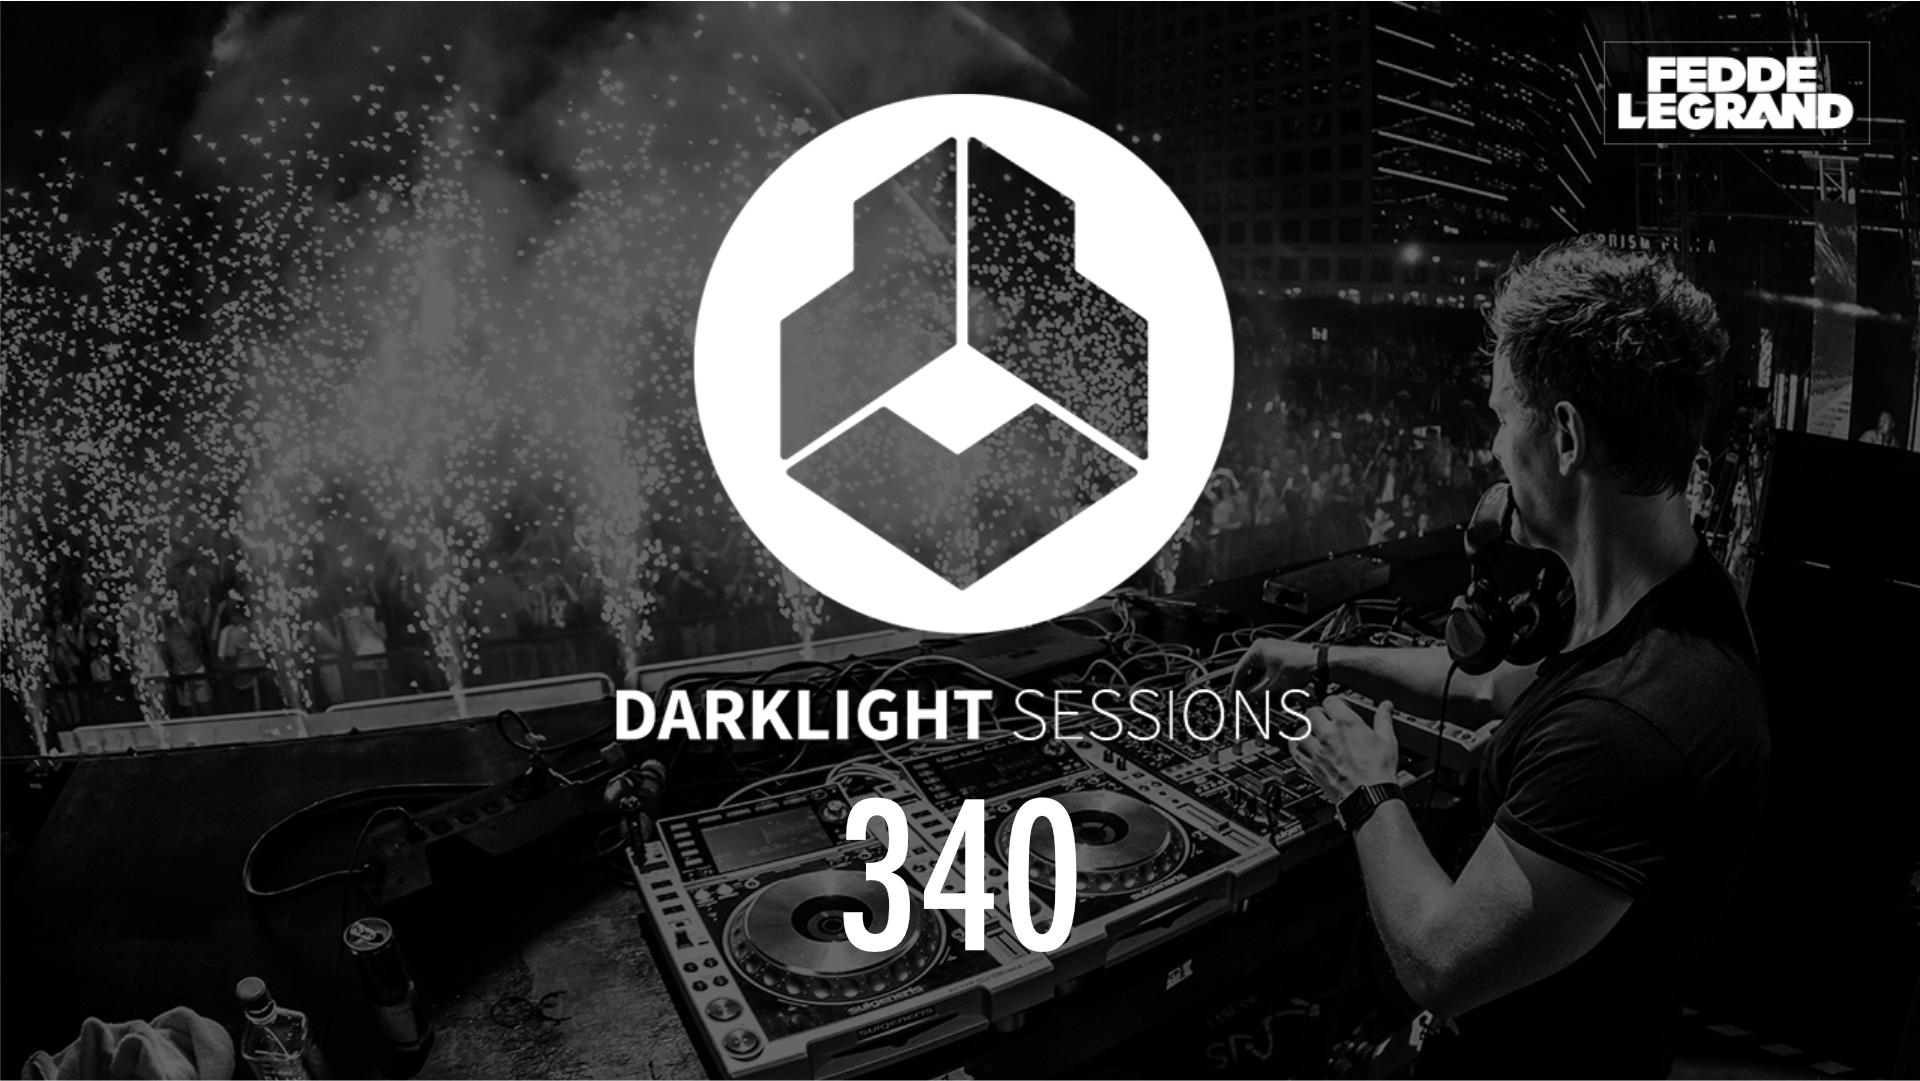 Darklight Sessions 340